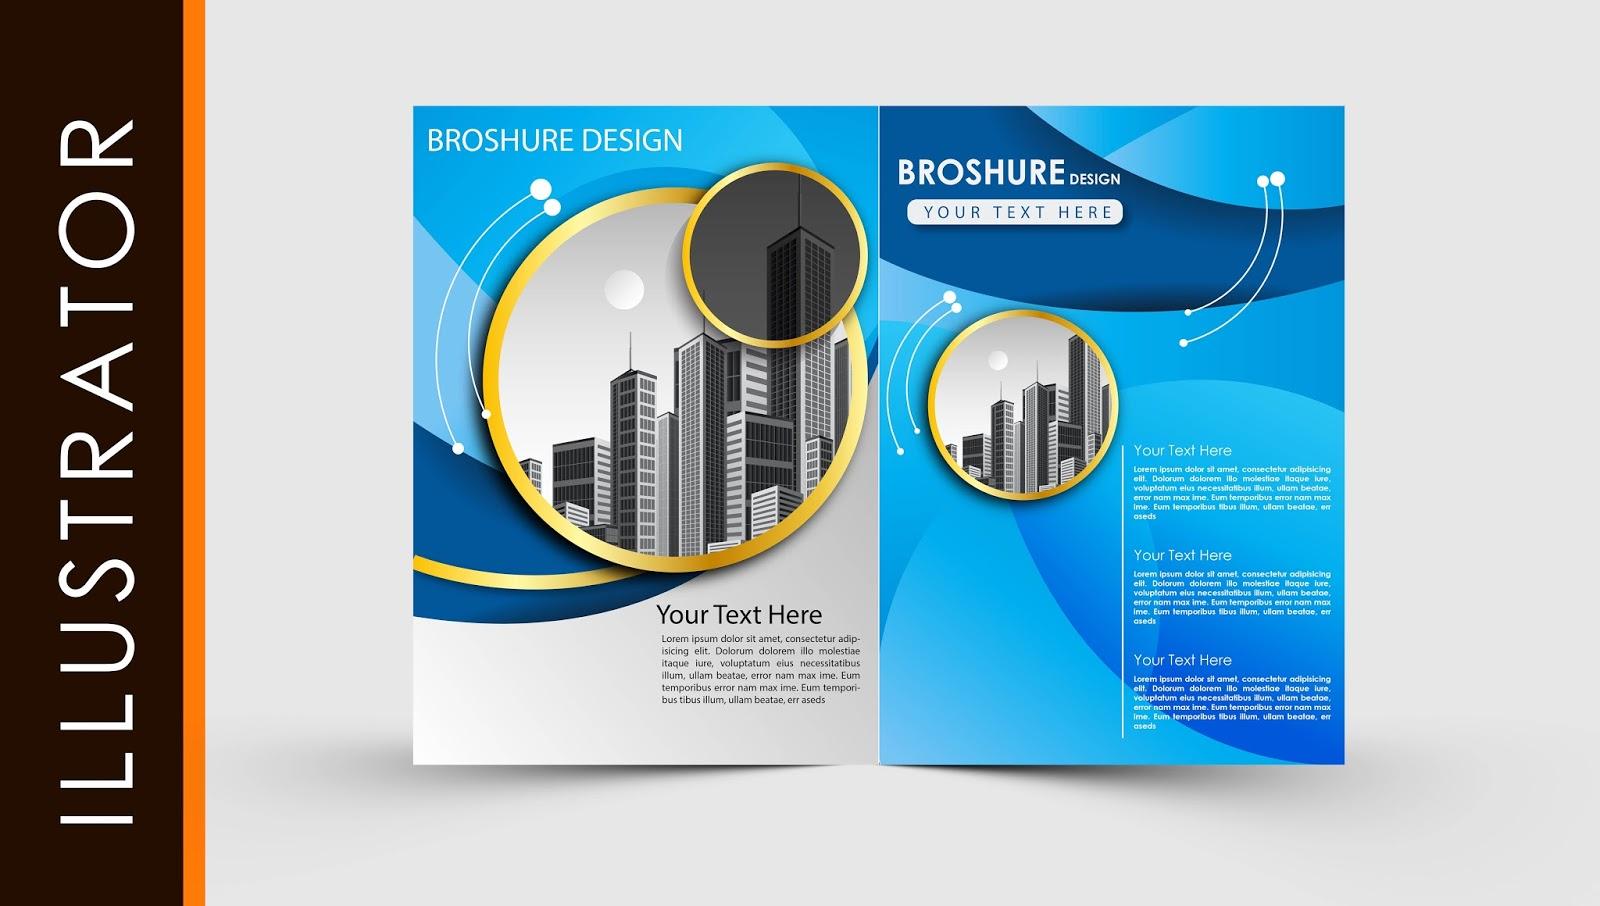 Free Download Adobe Illustrator Template Brochure Two Fold Throughout Adobe Illustrator Brochure Templates Free Download